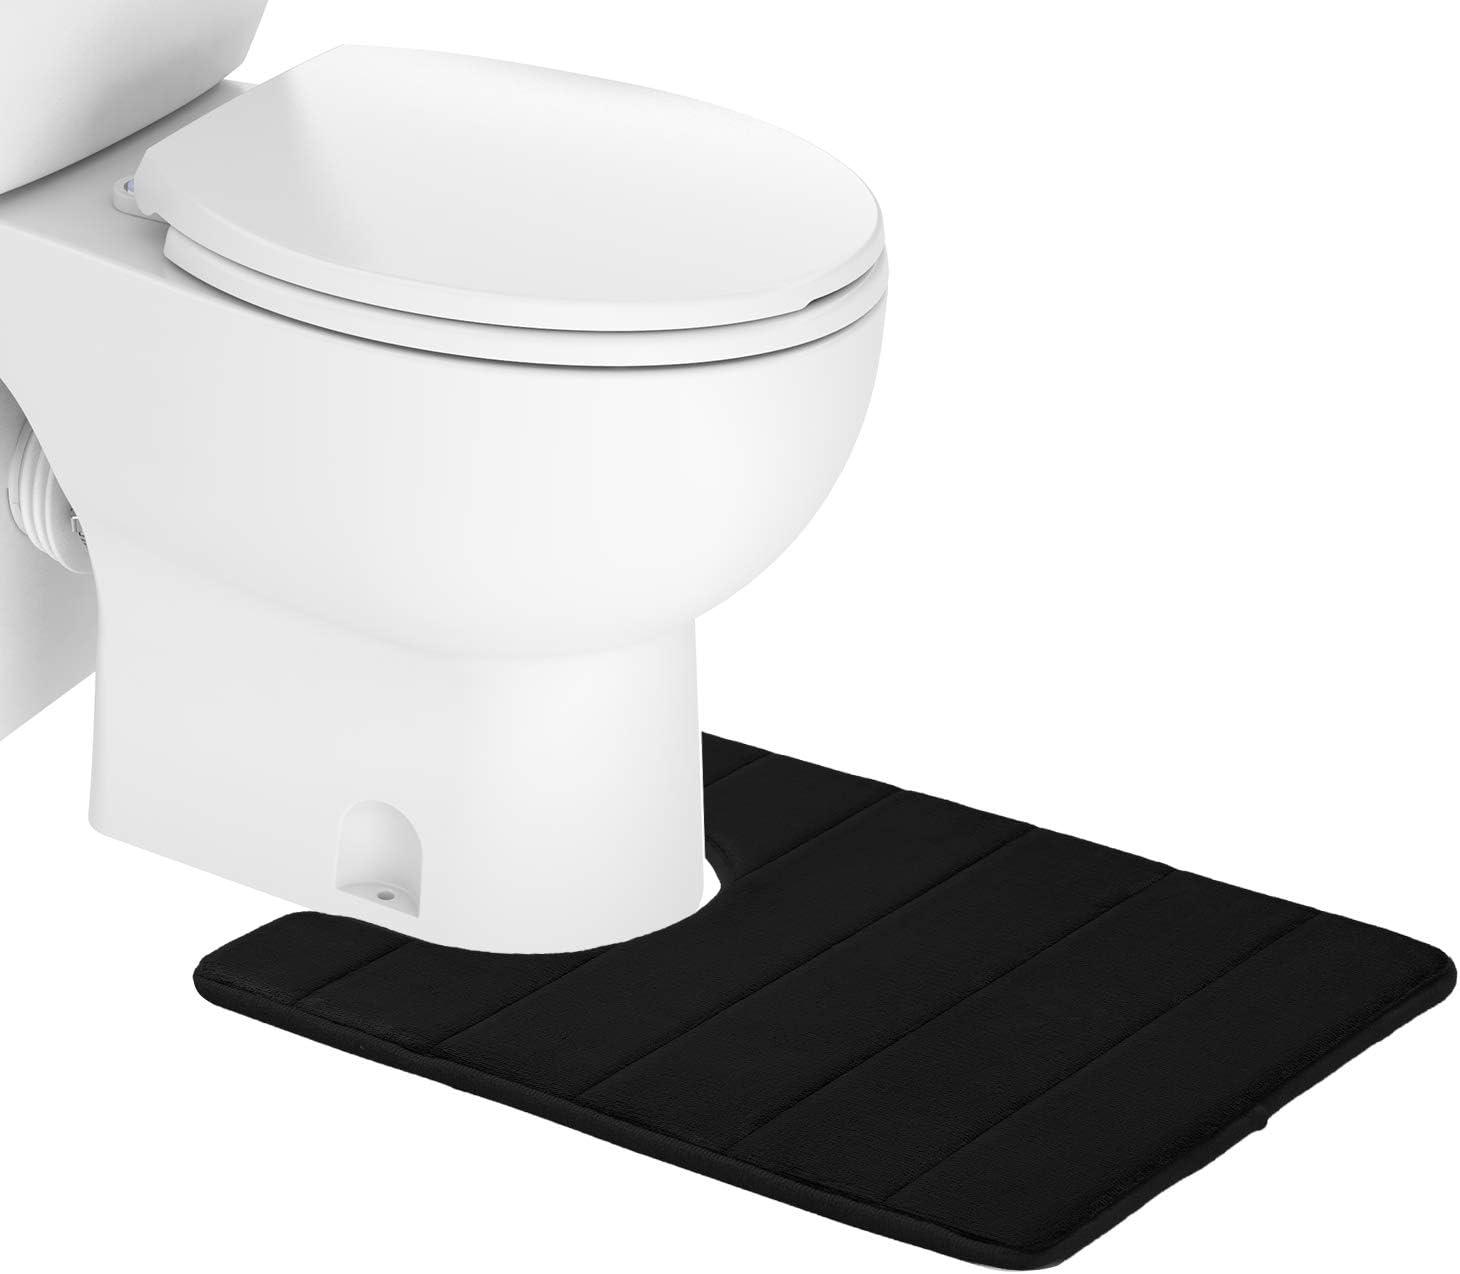 Colorxy Memory Foam Bath Mat - Soft & Absorbent Bathroom Toilet Bath Rugs U-Shaped Non Slip Commode Contour Rug, 20